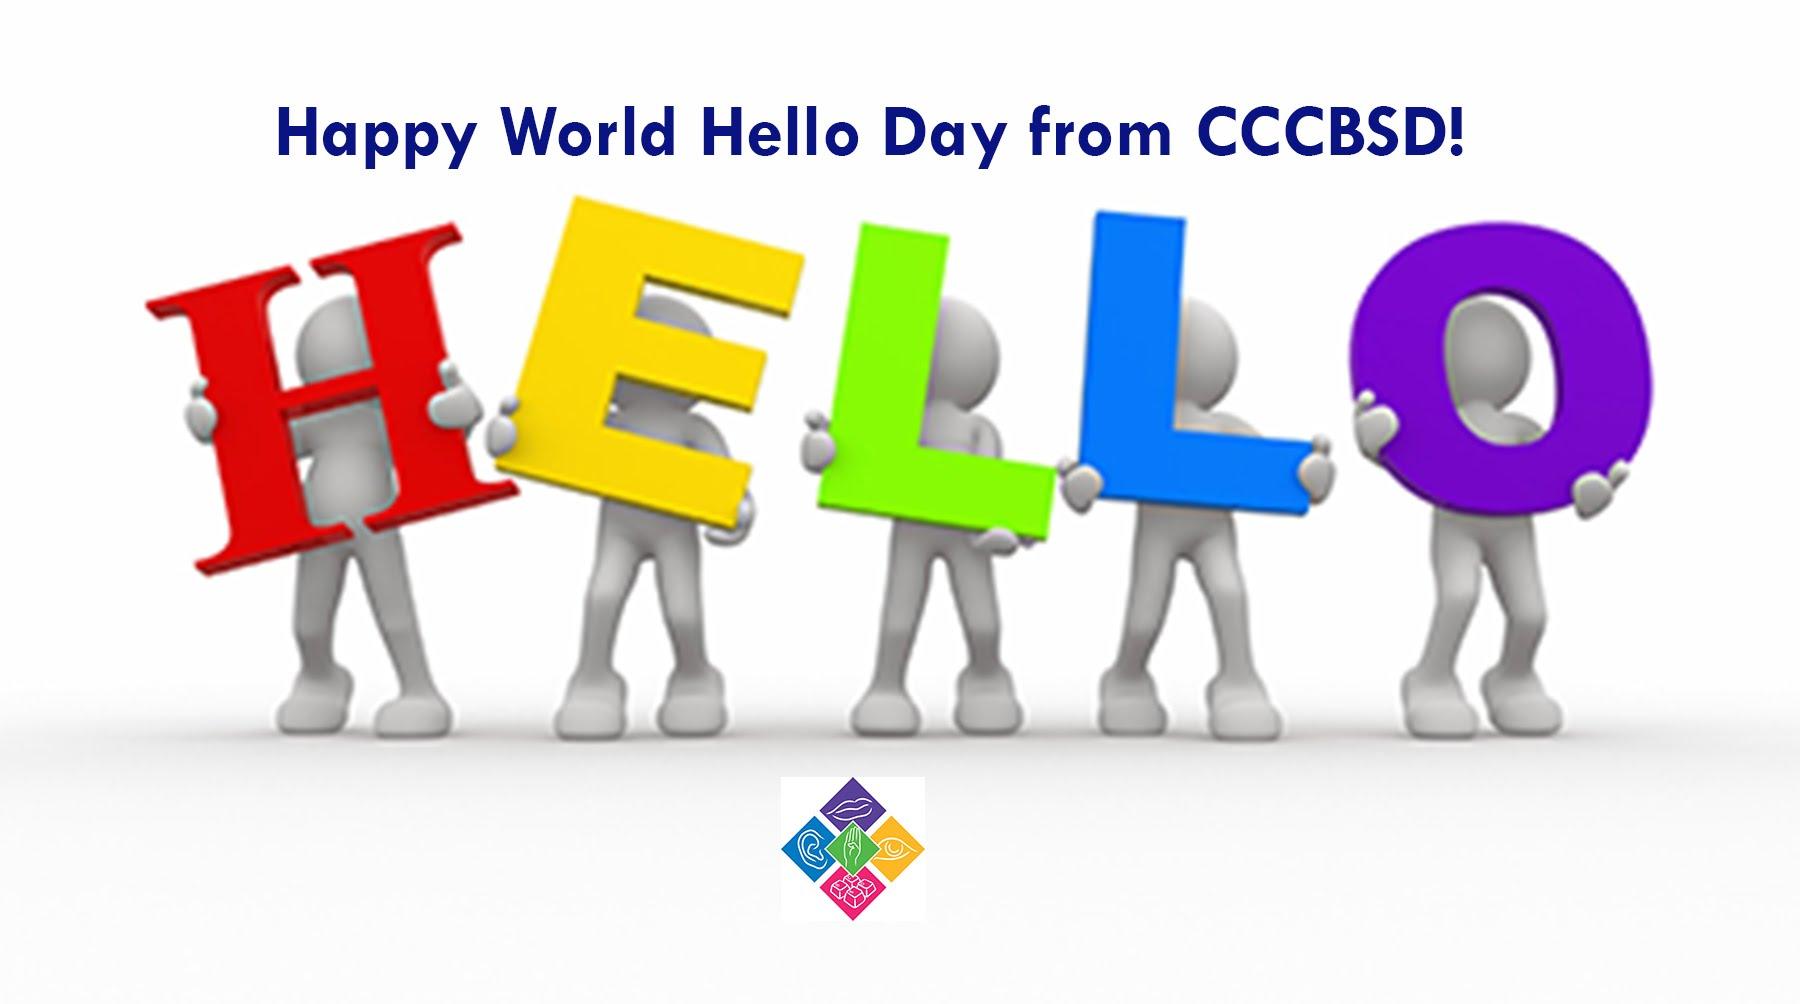 Happy World Hello Day Cartoon Picture